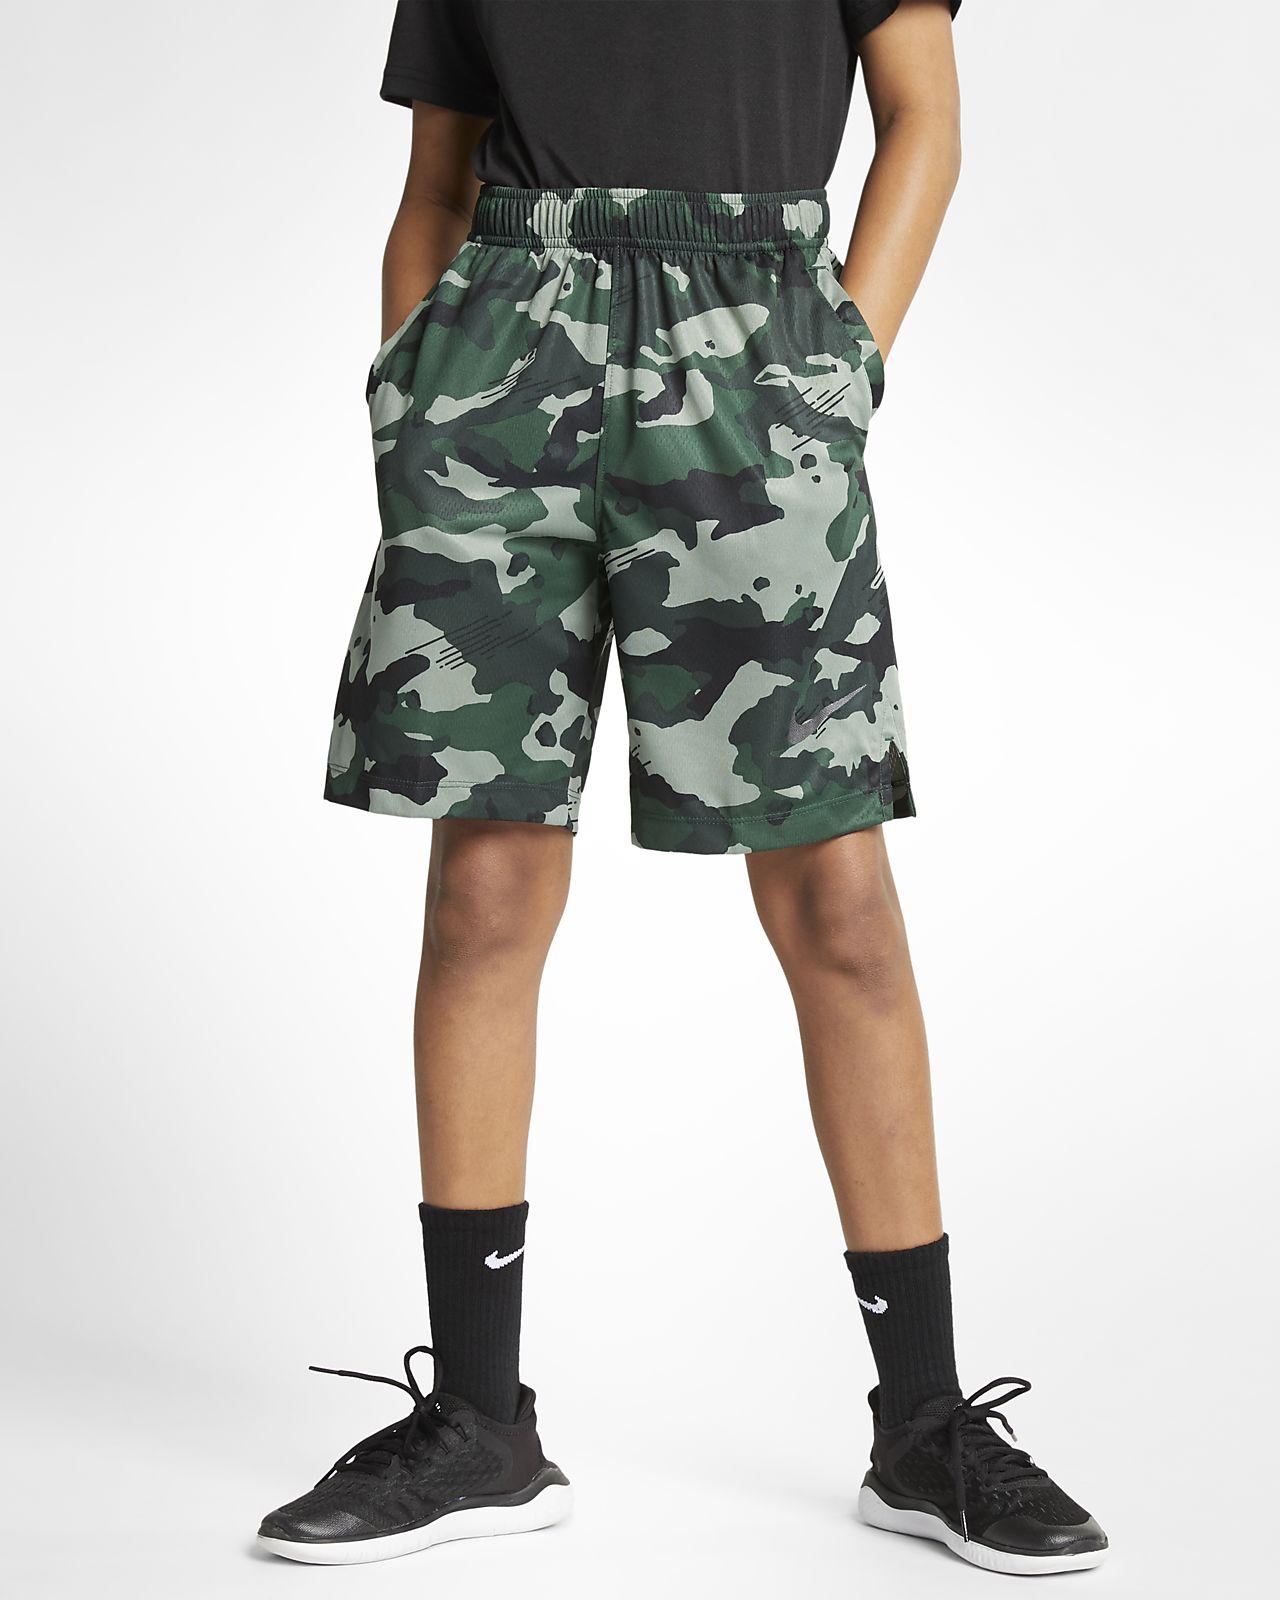 Nike Dri-FIT Big Kids' (Boys') Camo Training Shorts